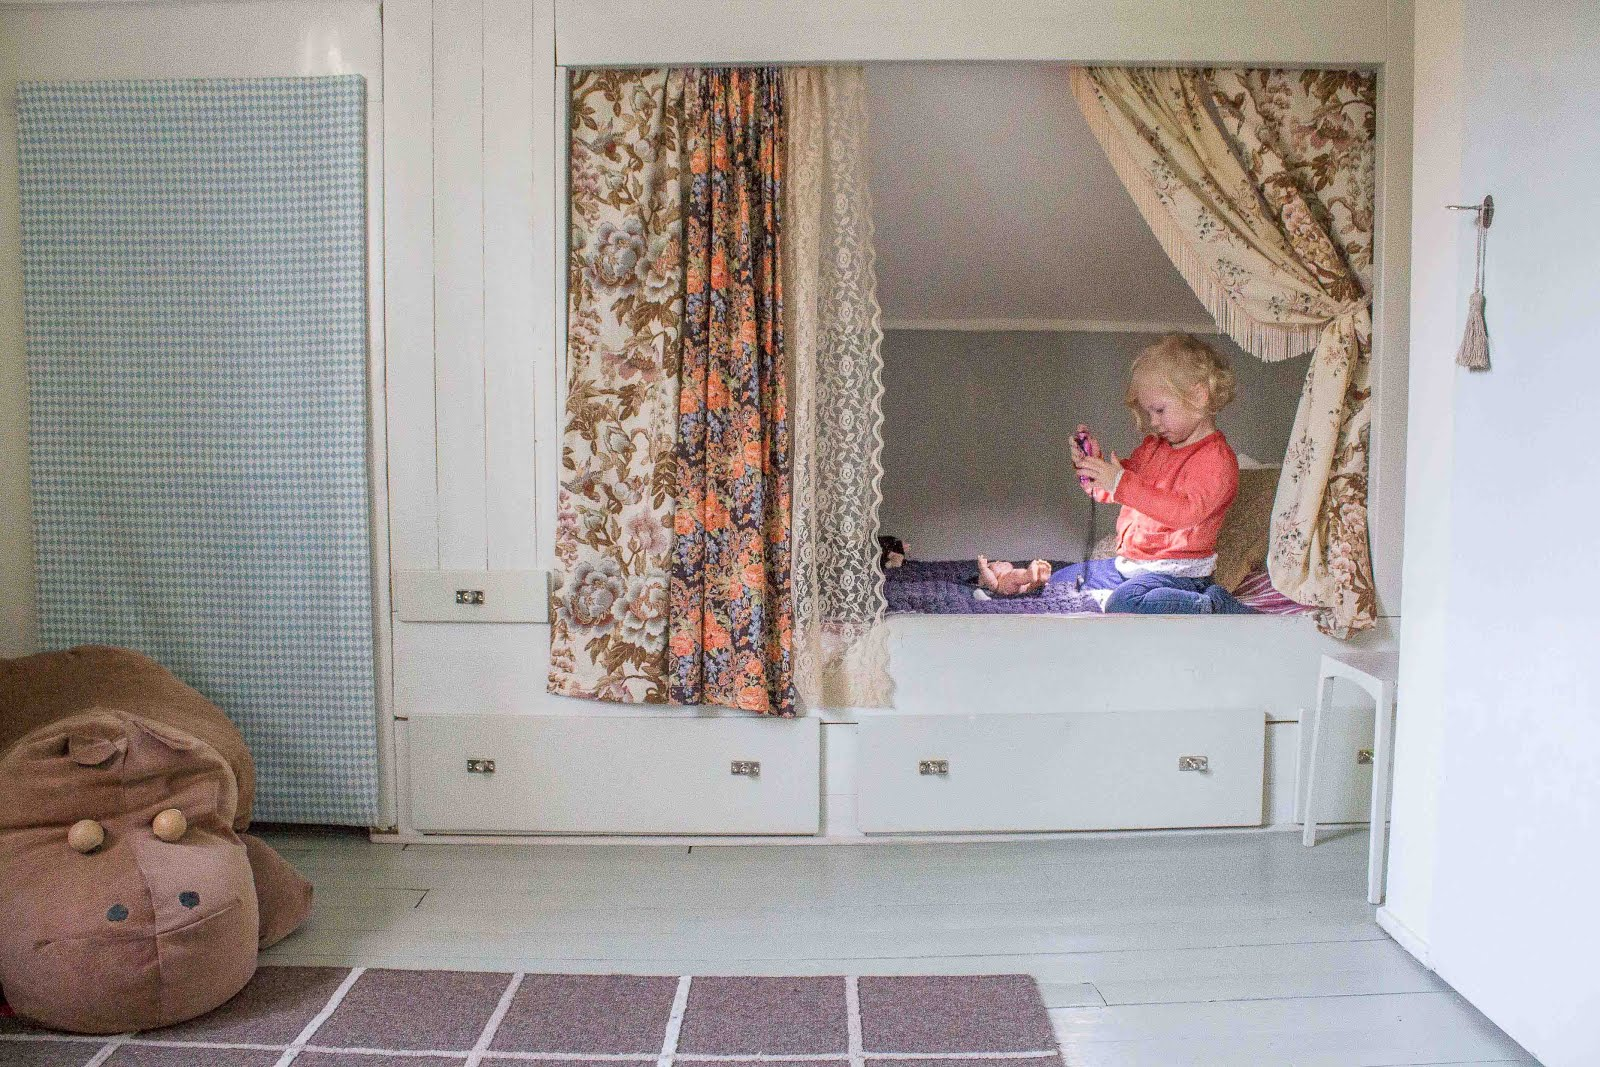 Fru Åberg i Lågbo: Plastbantat i fyraåringens kök